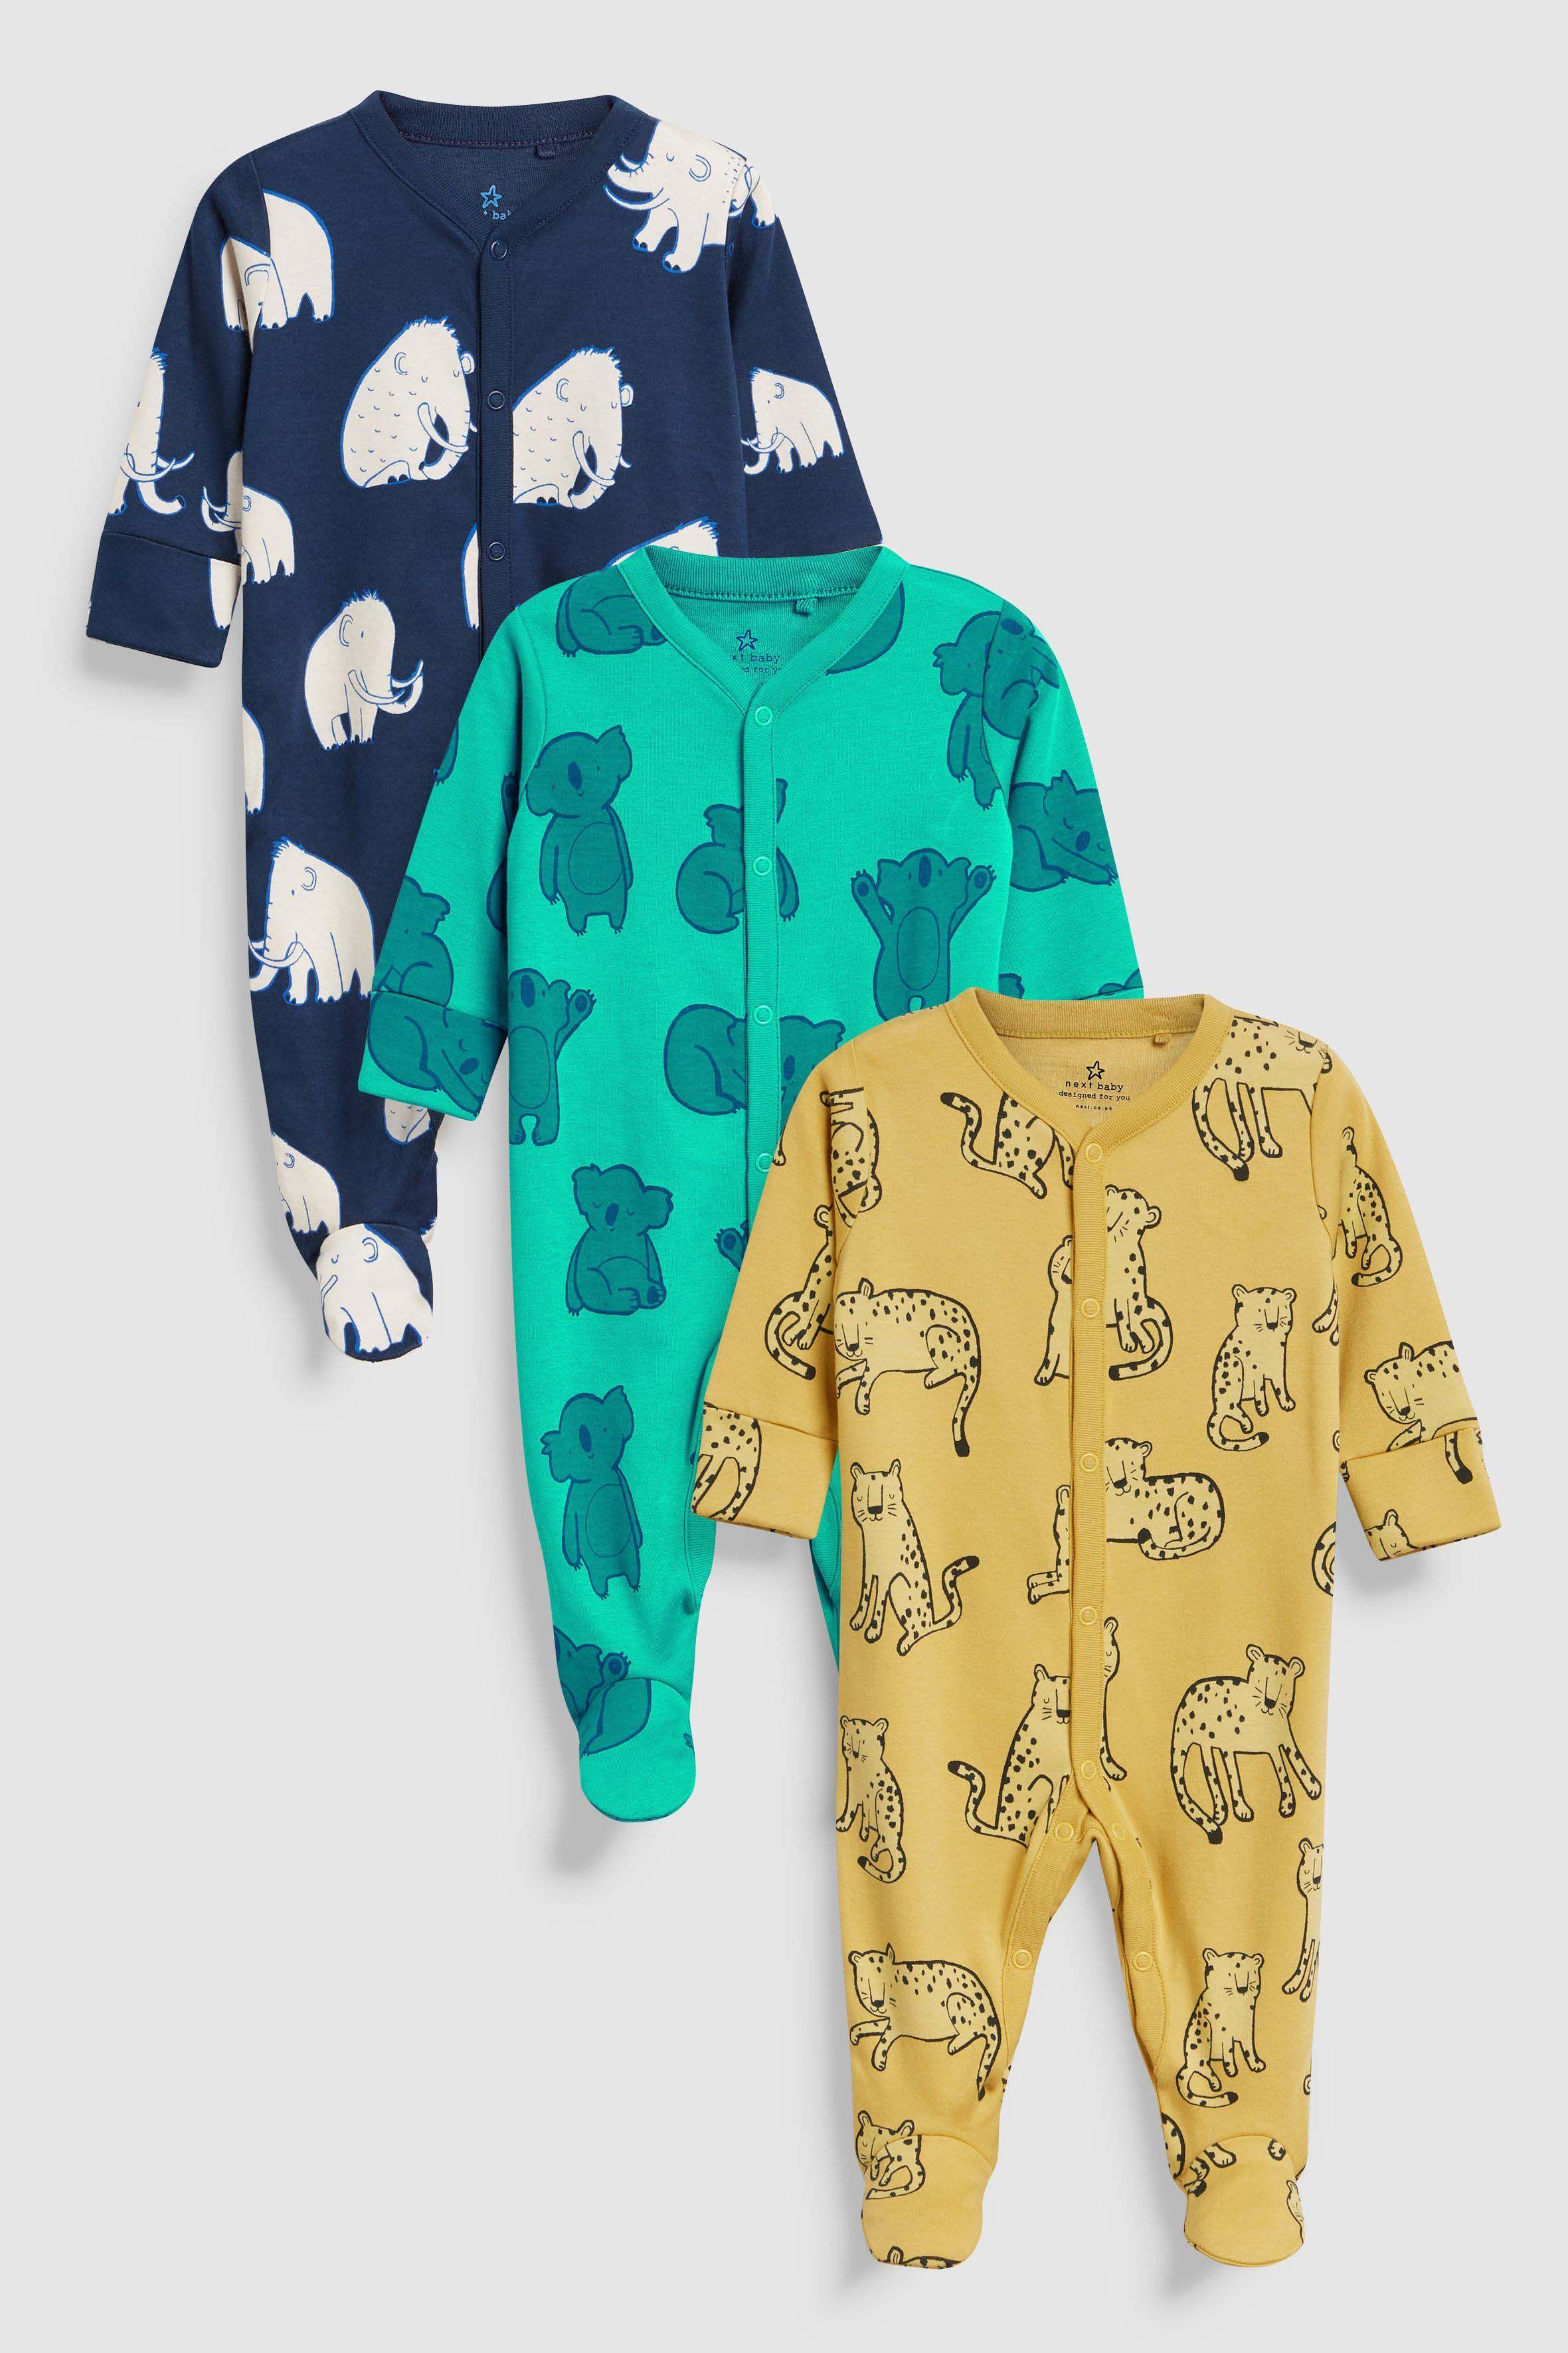 753fc4218 Boys Next Animal Character Sleepsuits Three Pack (0mths-2yrs ...